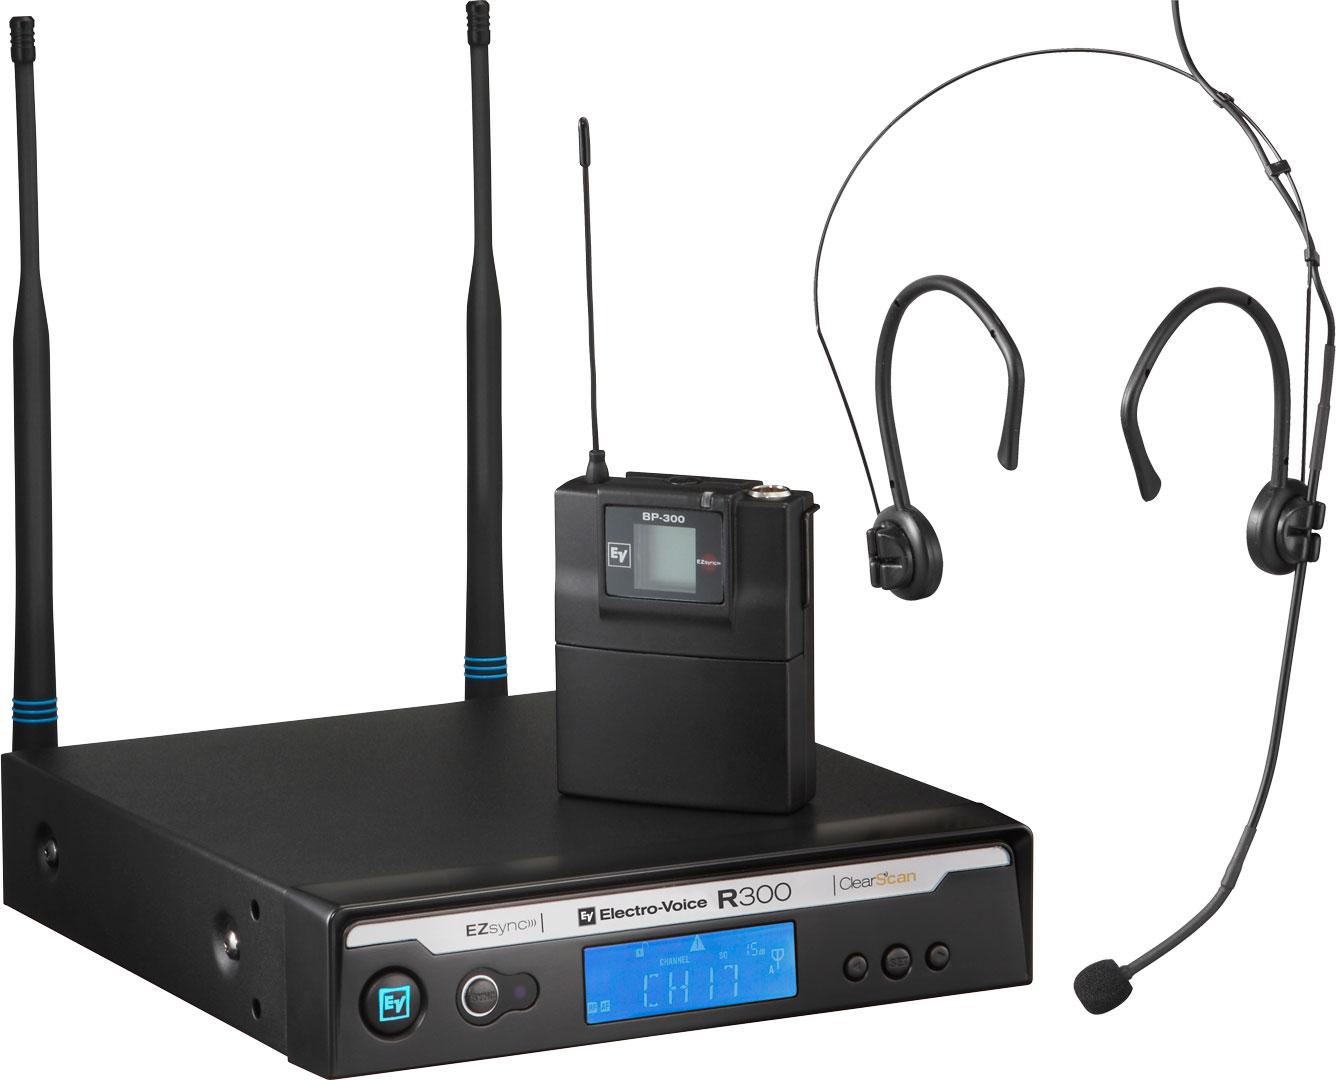 Billede af Electro-Voice R300-E Trådløs Headset mikrofon Frekvensbåndbredde A (618 - 634 MHz)